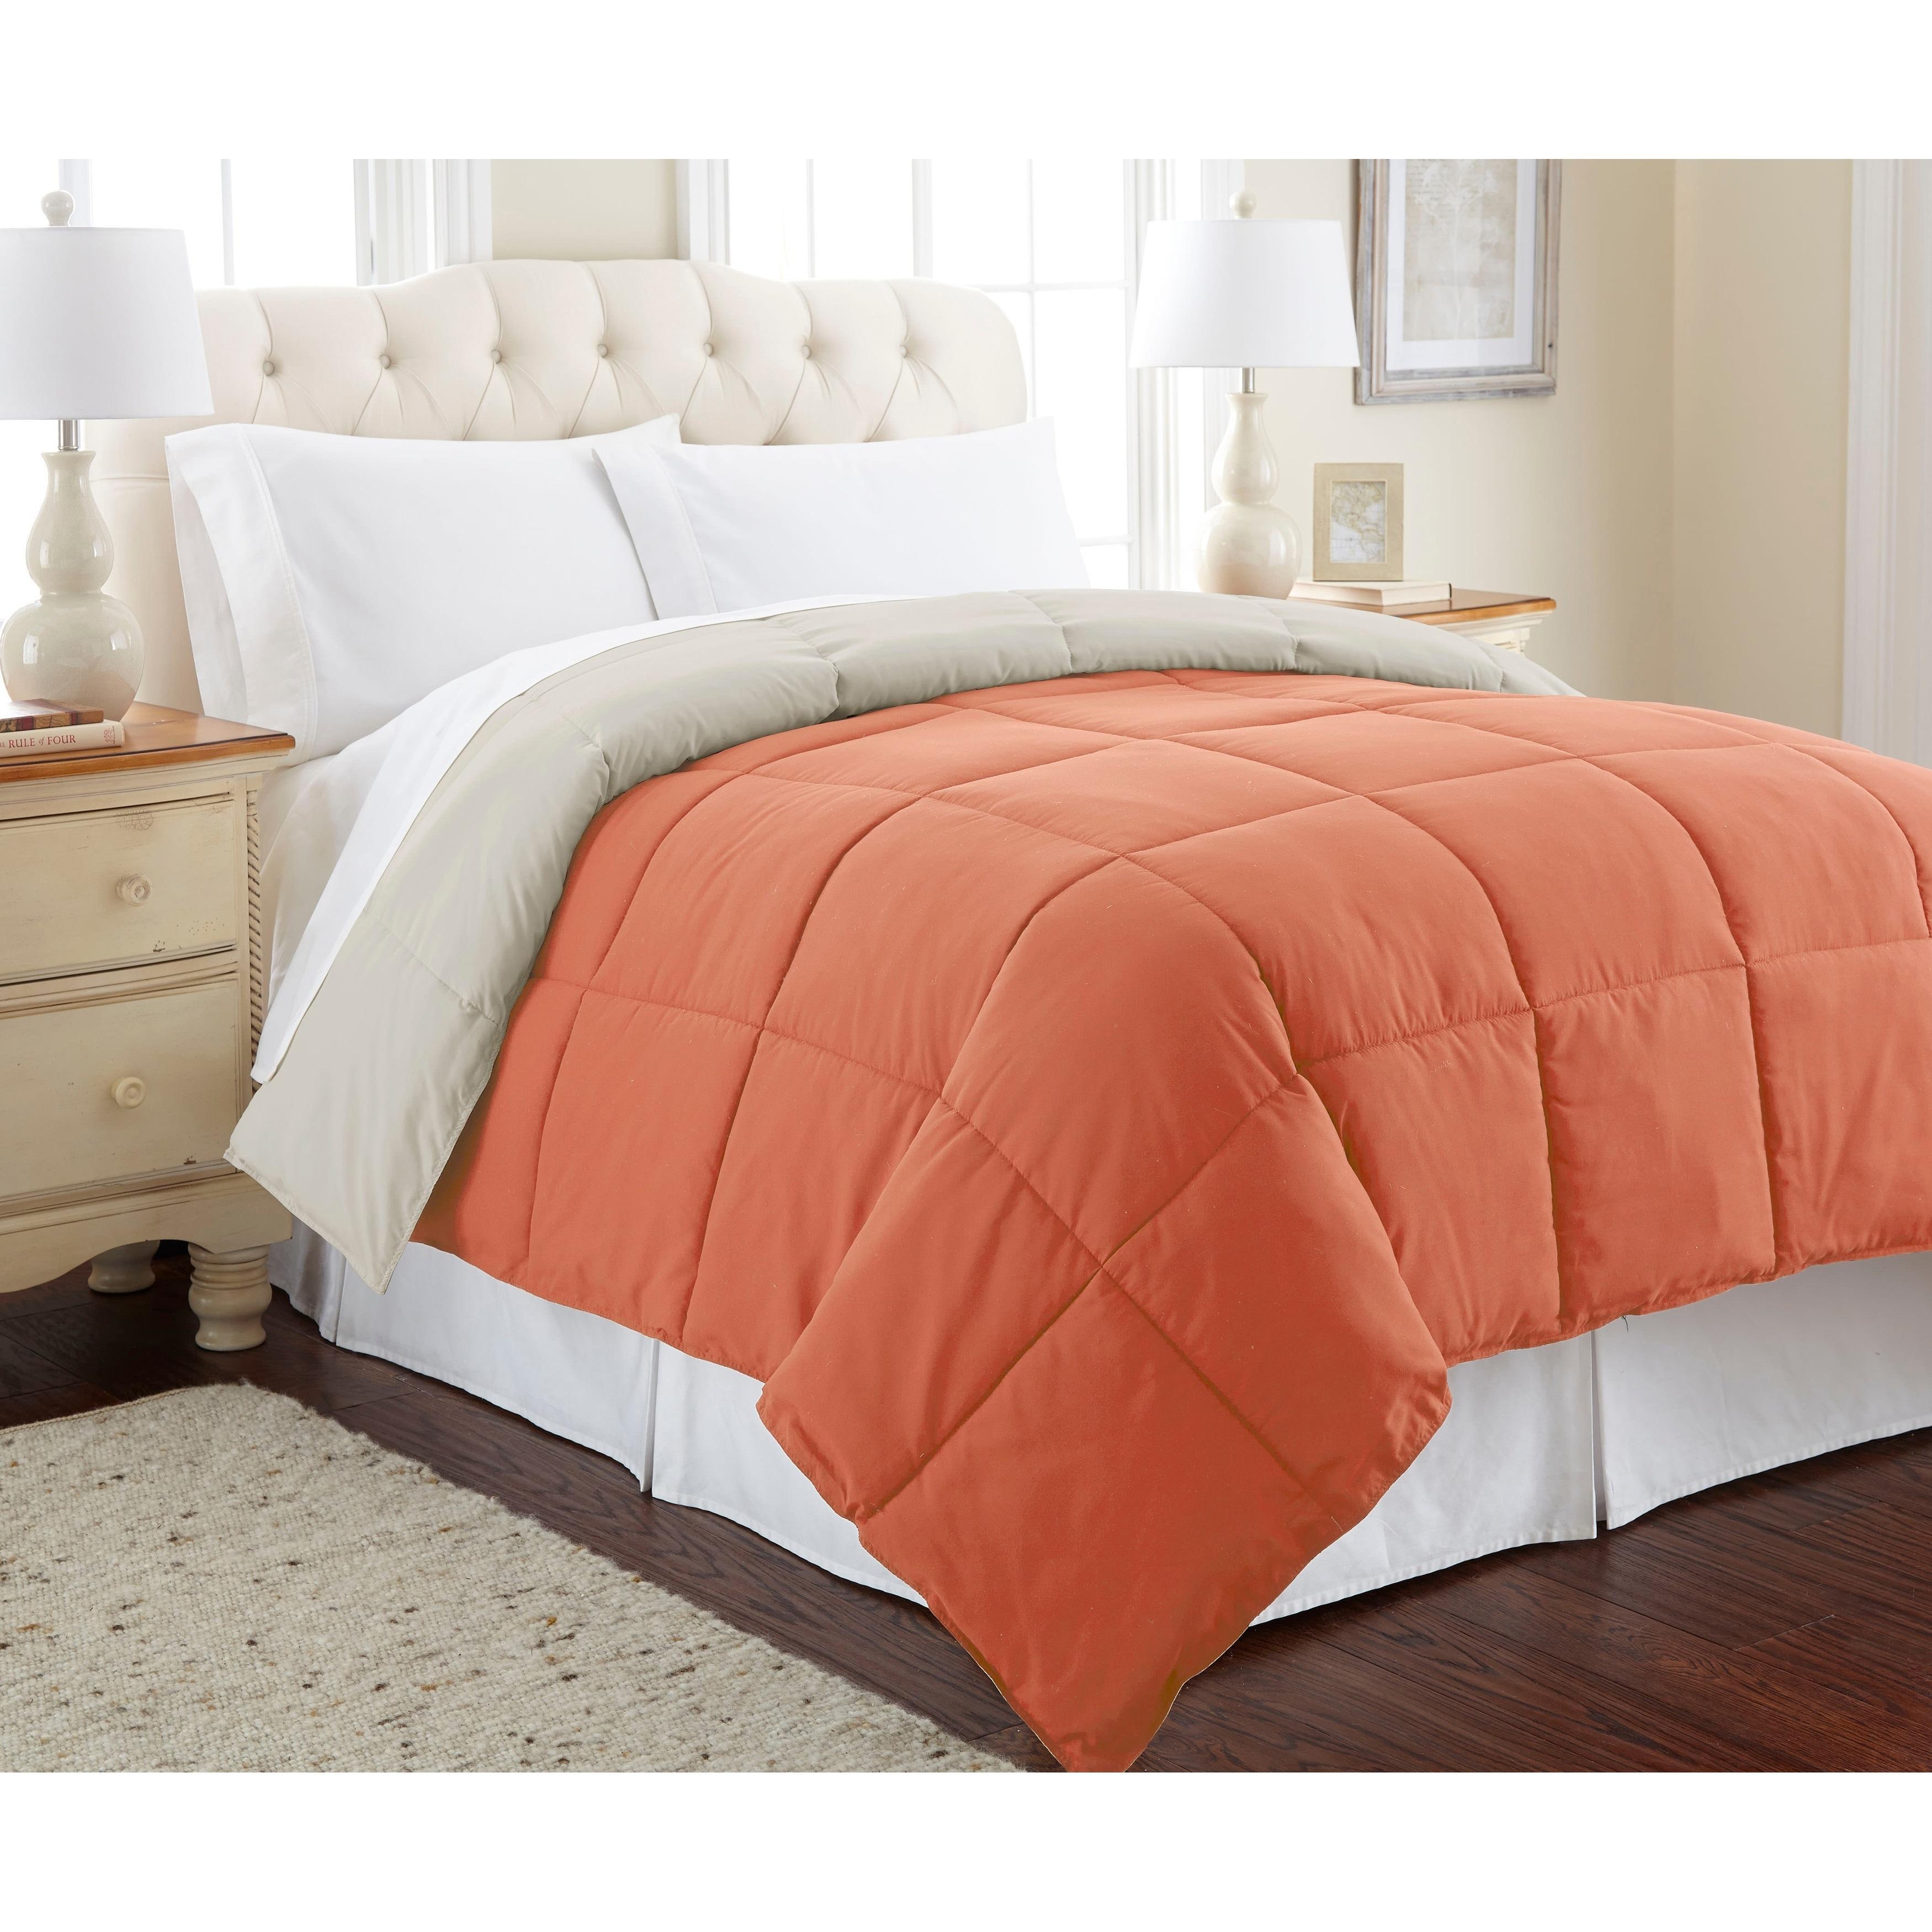 Amrapur Overseas All-season Reversible Down Alternative Comforter (Misty Jade/Seaport - King)